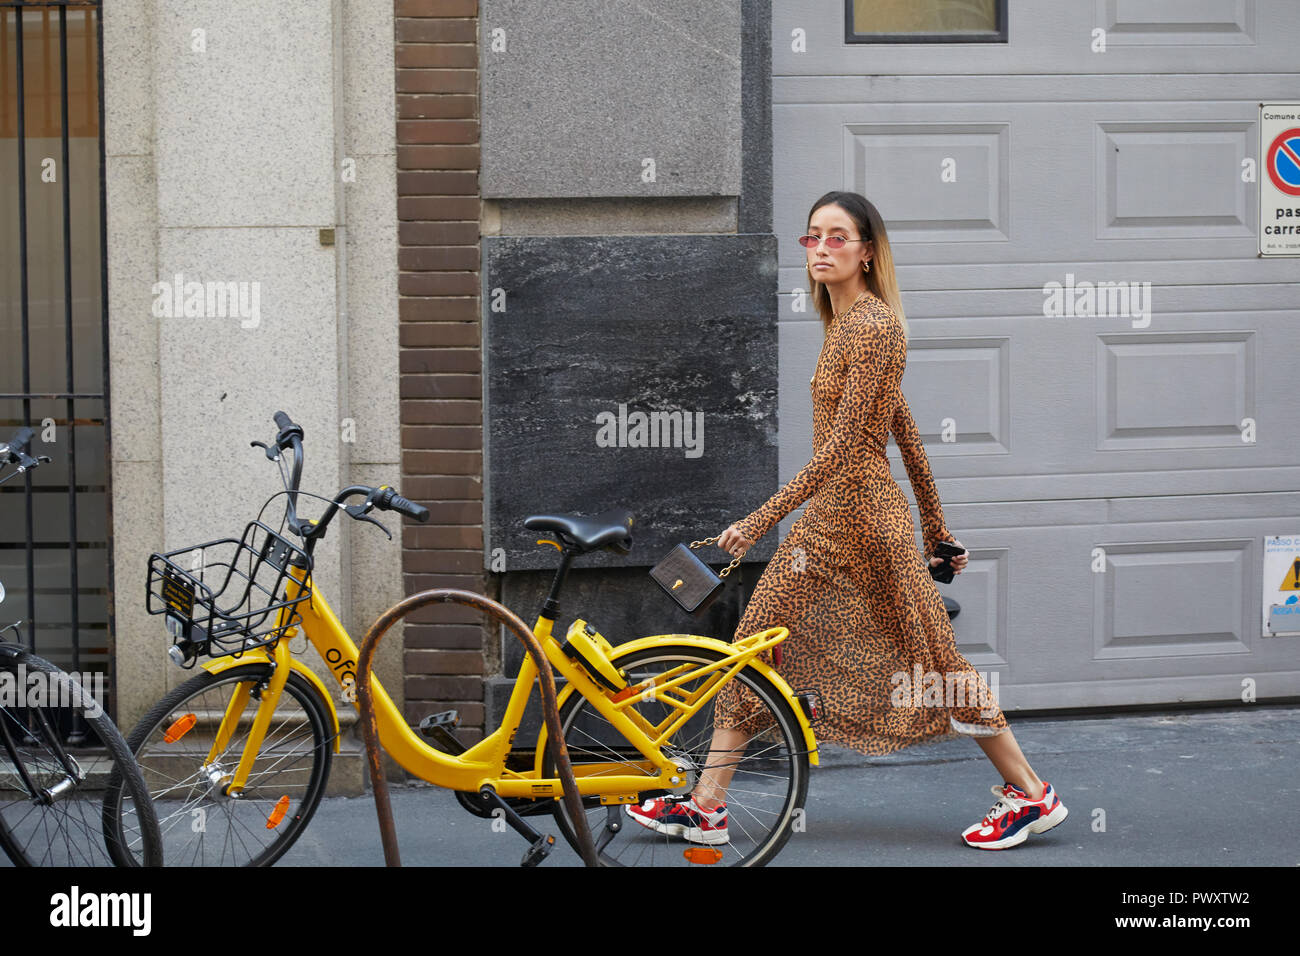 MILAN, ITALIE 21 septembre 2018 : Femme avec motif léopard